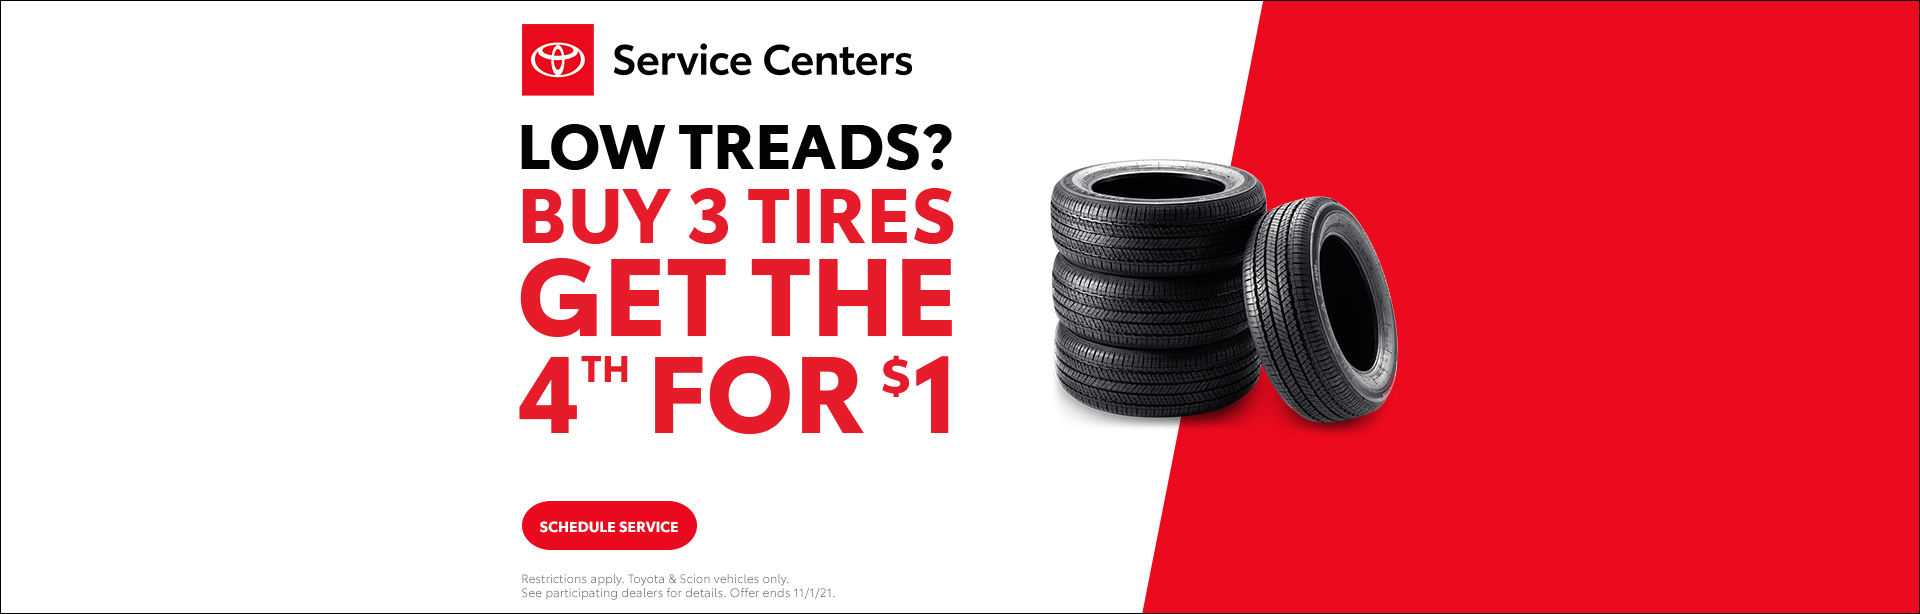 10-21_01_NY-September-2021-NAT-Buy-3-Tires---NY_1920x614_a29a_All-Models_R_xta.jpeg